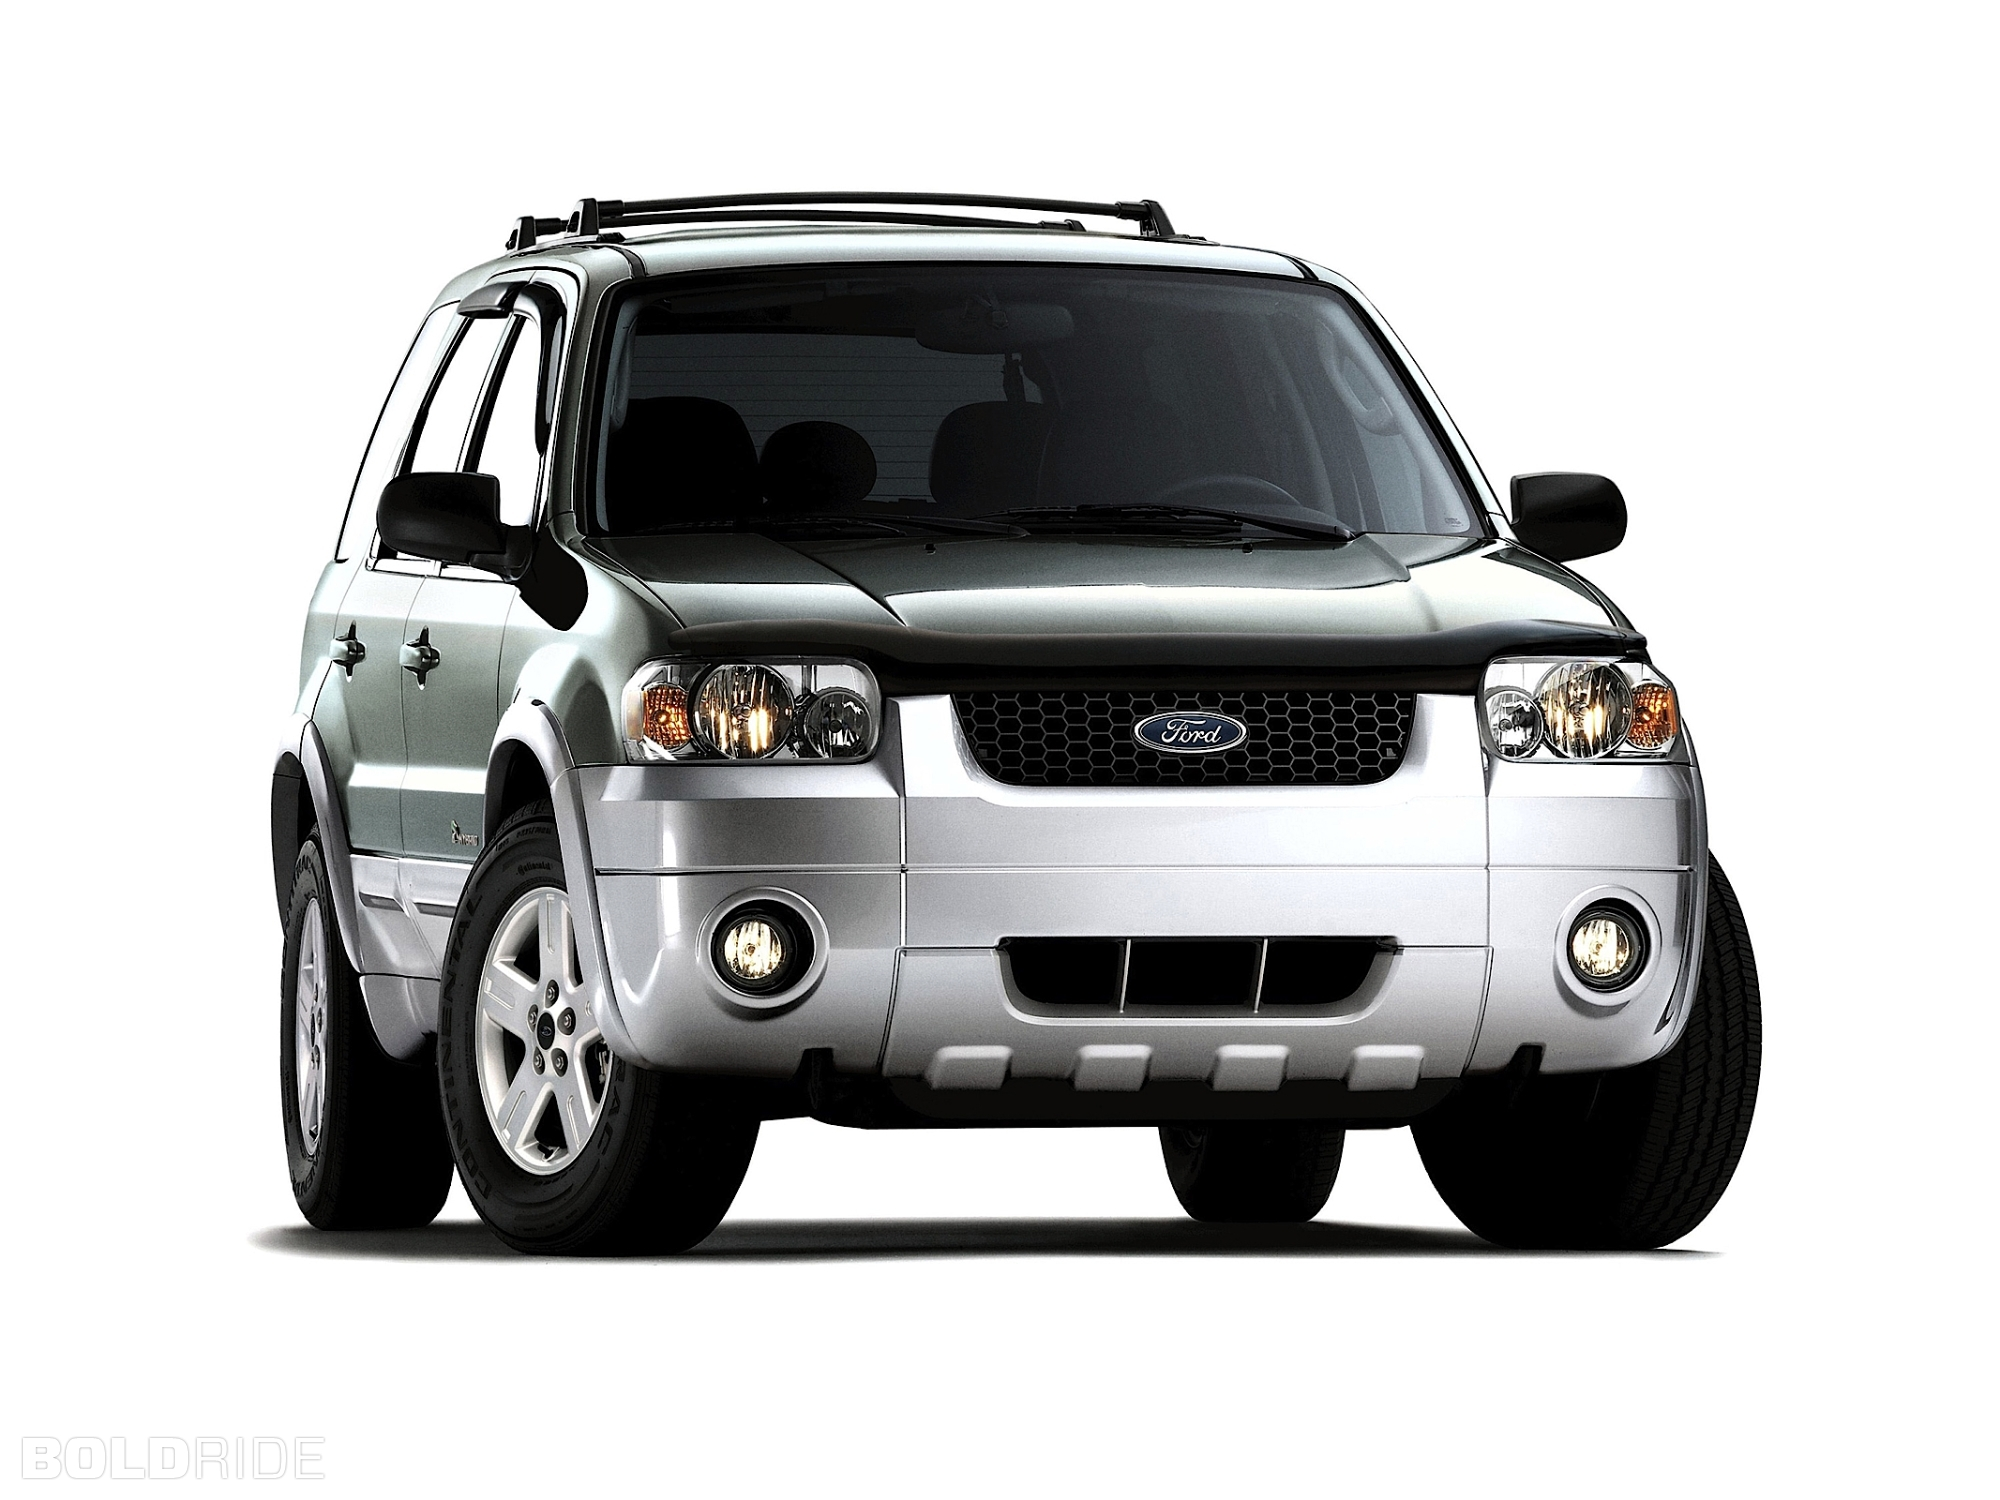 2006 ford escape hybrid image 15